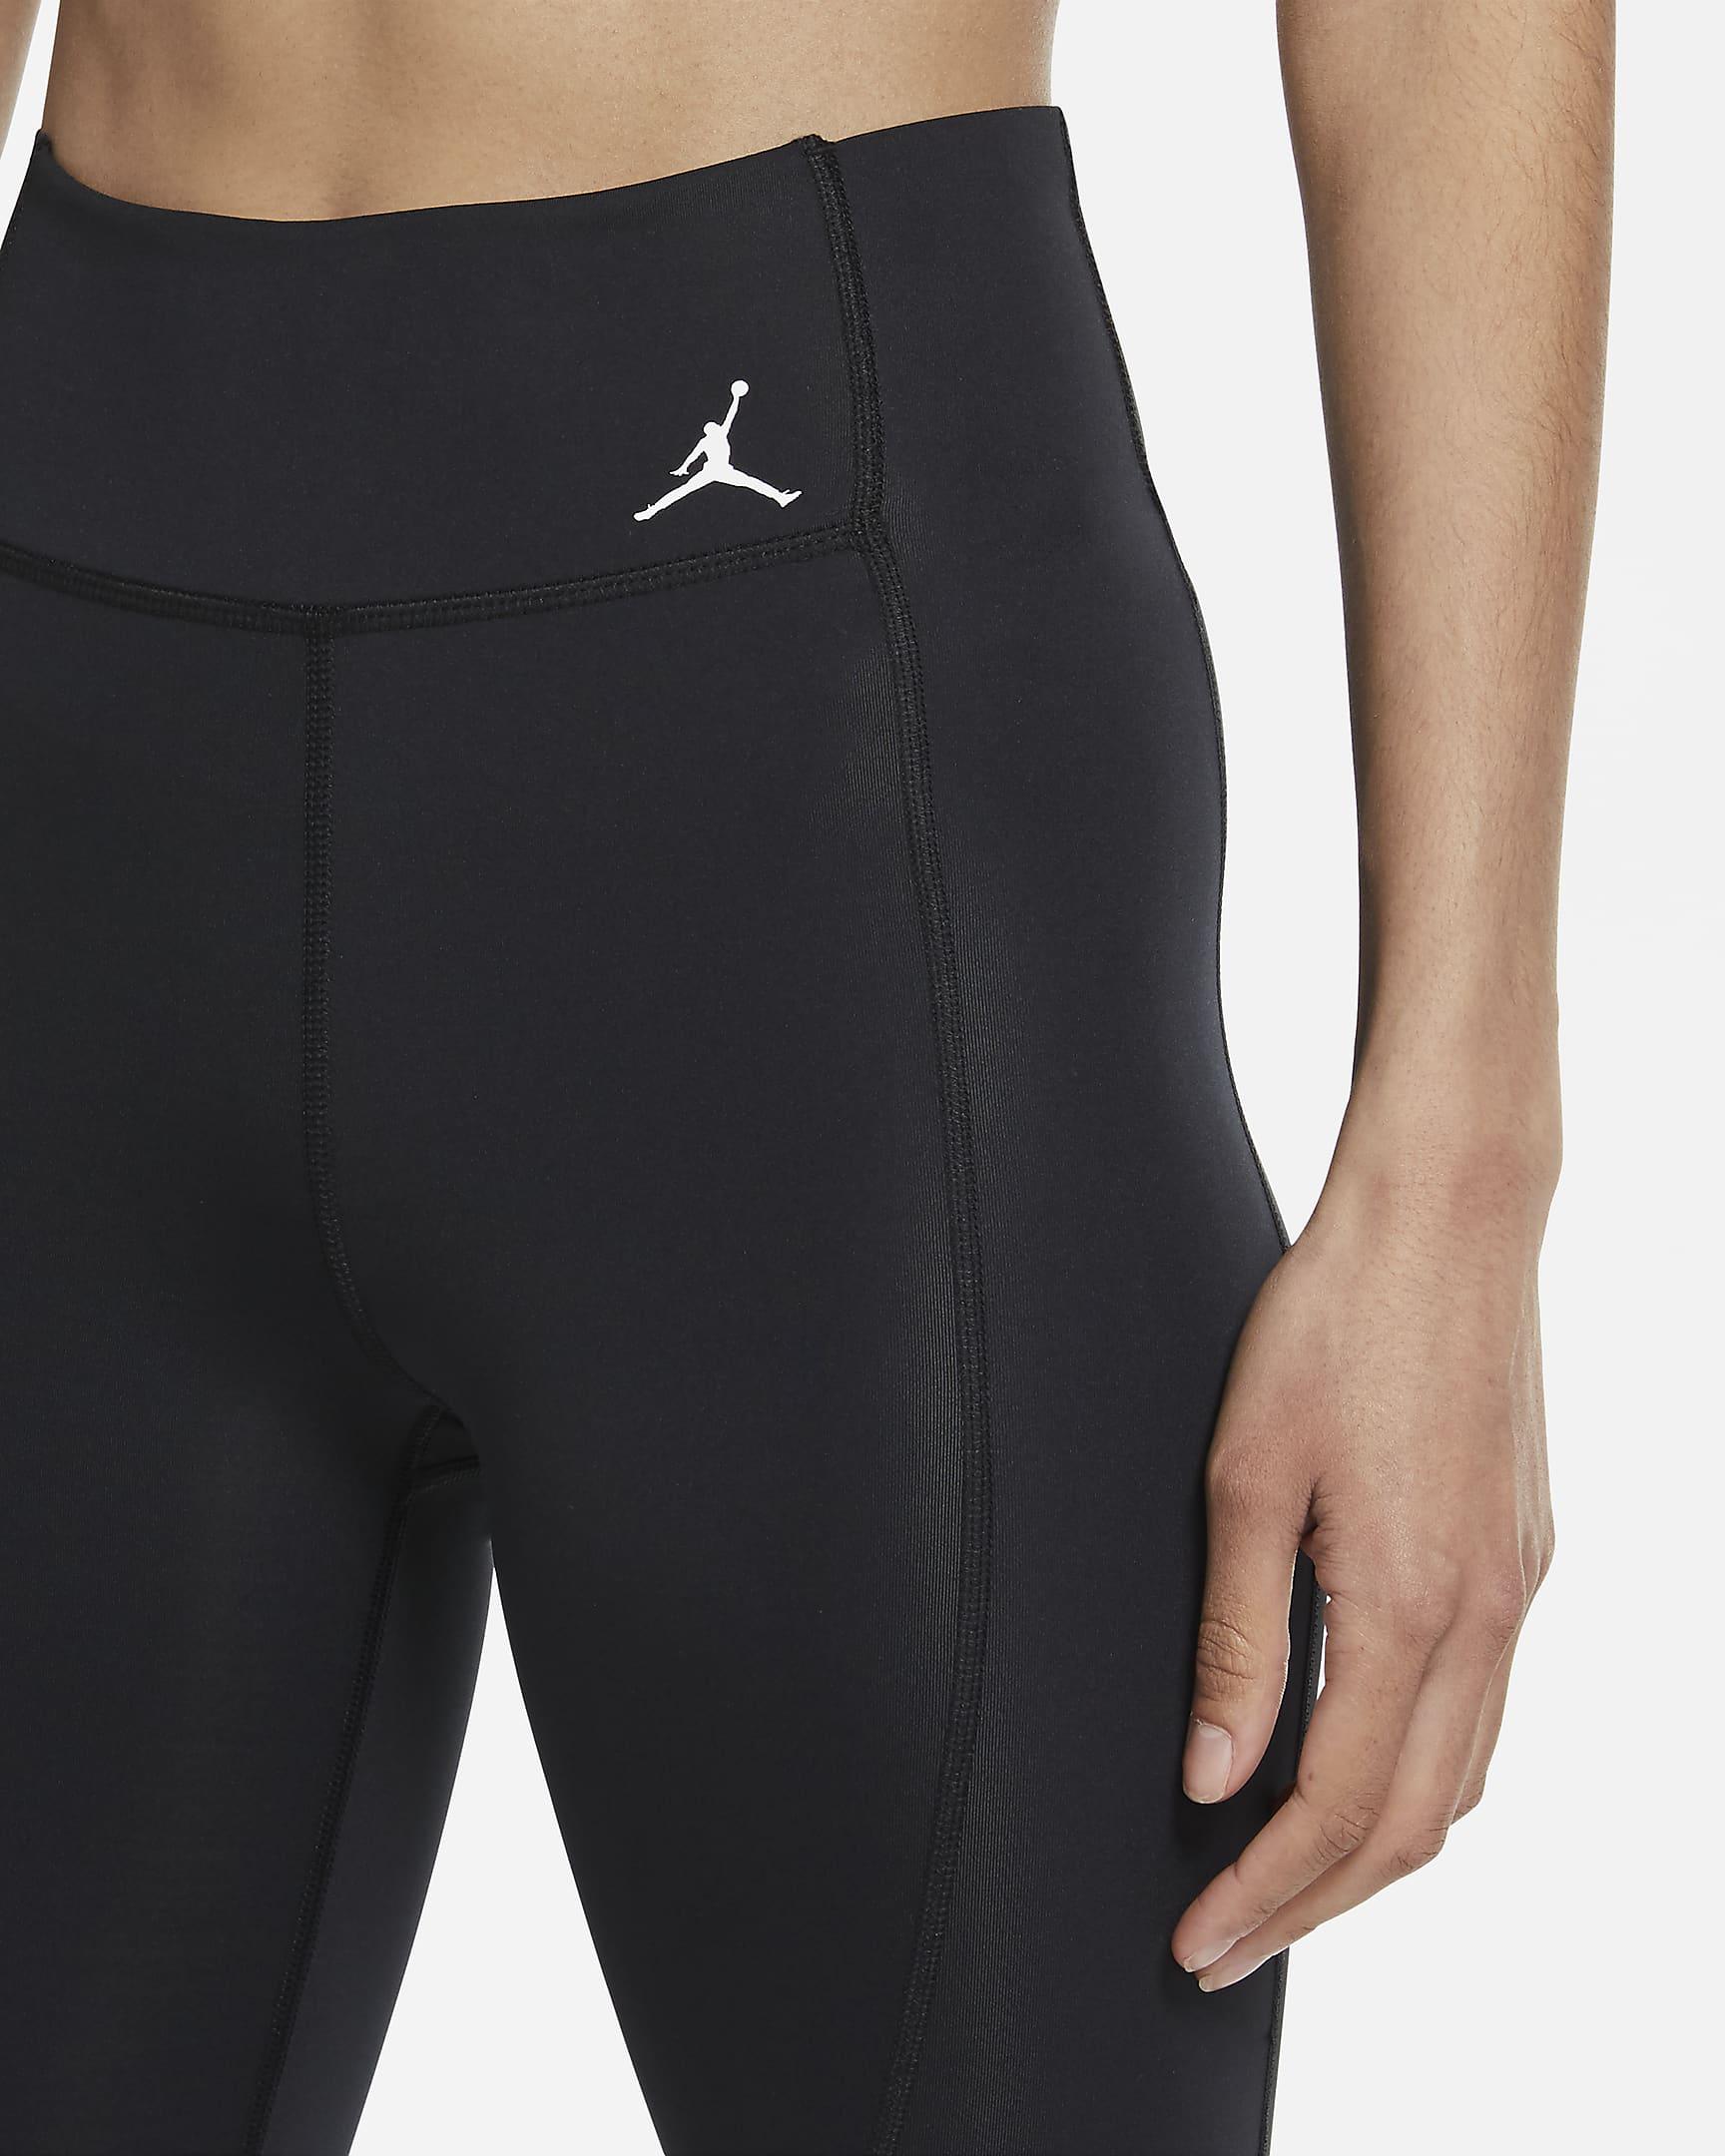 jordan-essential-womens-7-8-leggings-N3lDkx-1.png